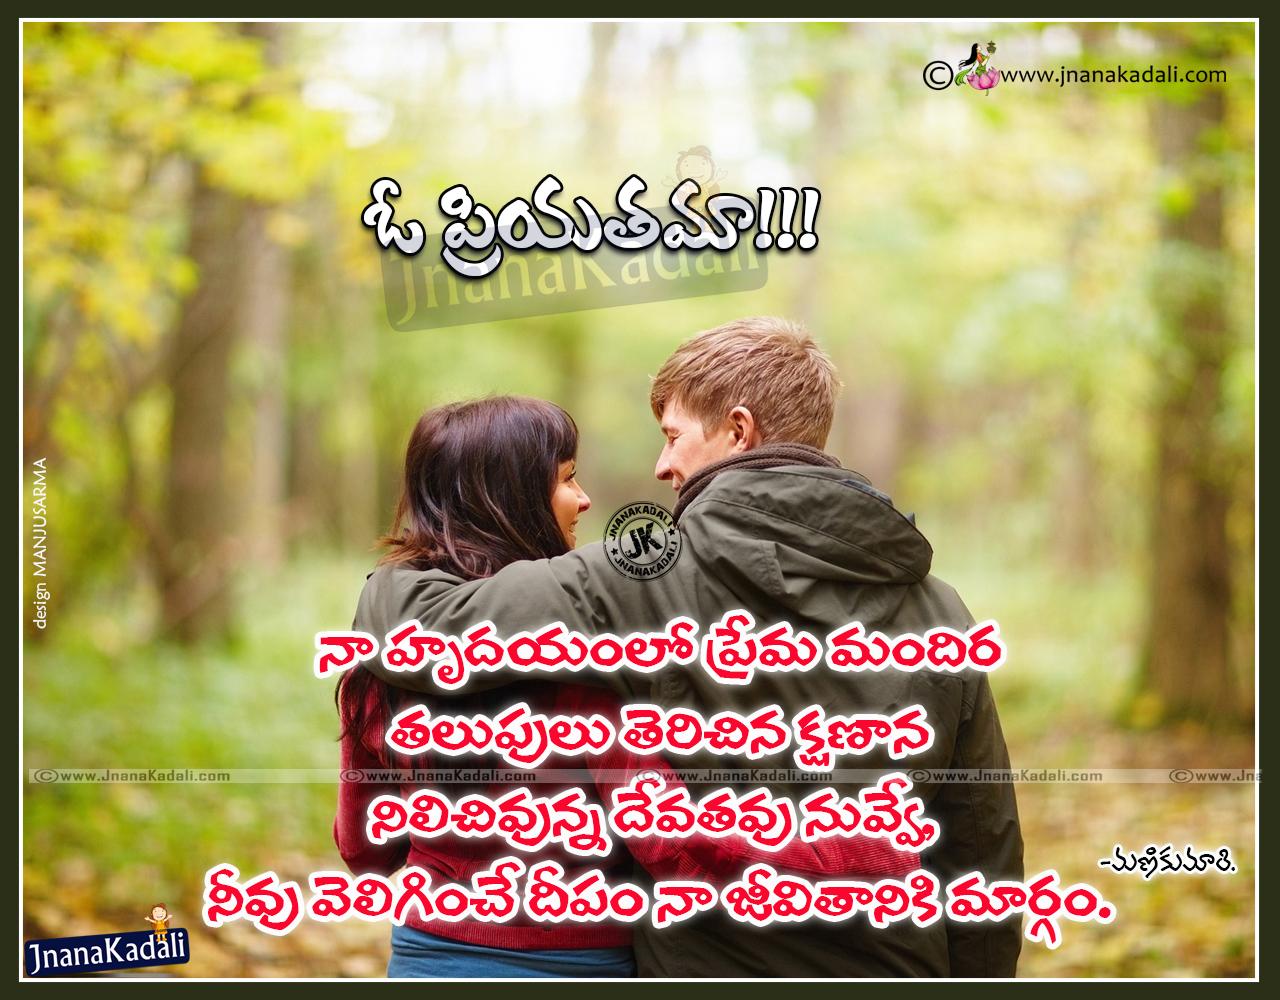 Must see Wallpaper Love Telugu - Love%2Bquote%2Bwith%2Bcouple%2Bimages%2Bwallpaper%2BinTelugu%2Bwith%2BTelug%2Bkavithalu%2Bwritten%2Bby%2BManiKumari-2016%2BJnanakadali  Photograph_95238.jpg